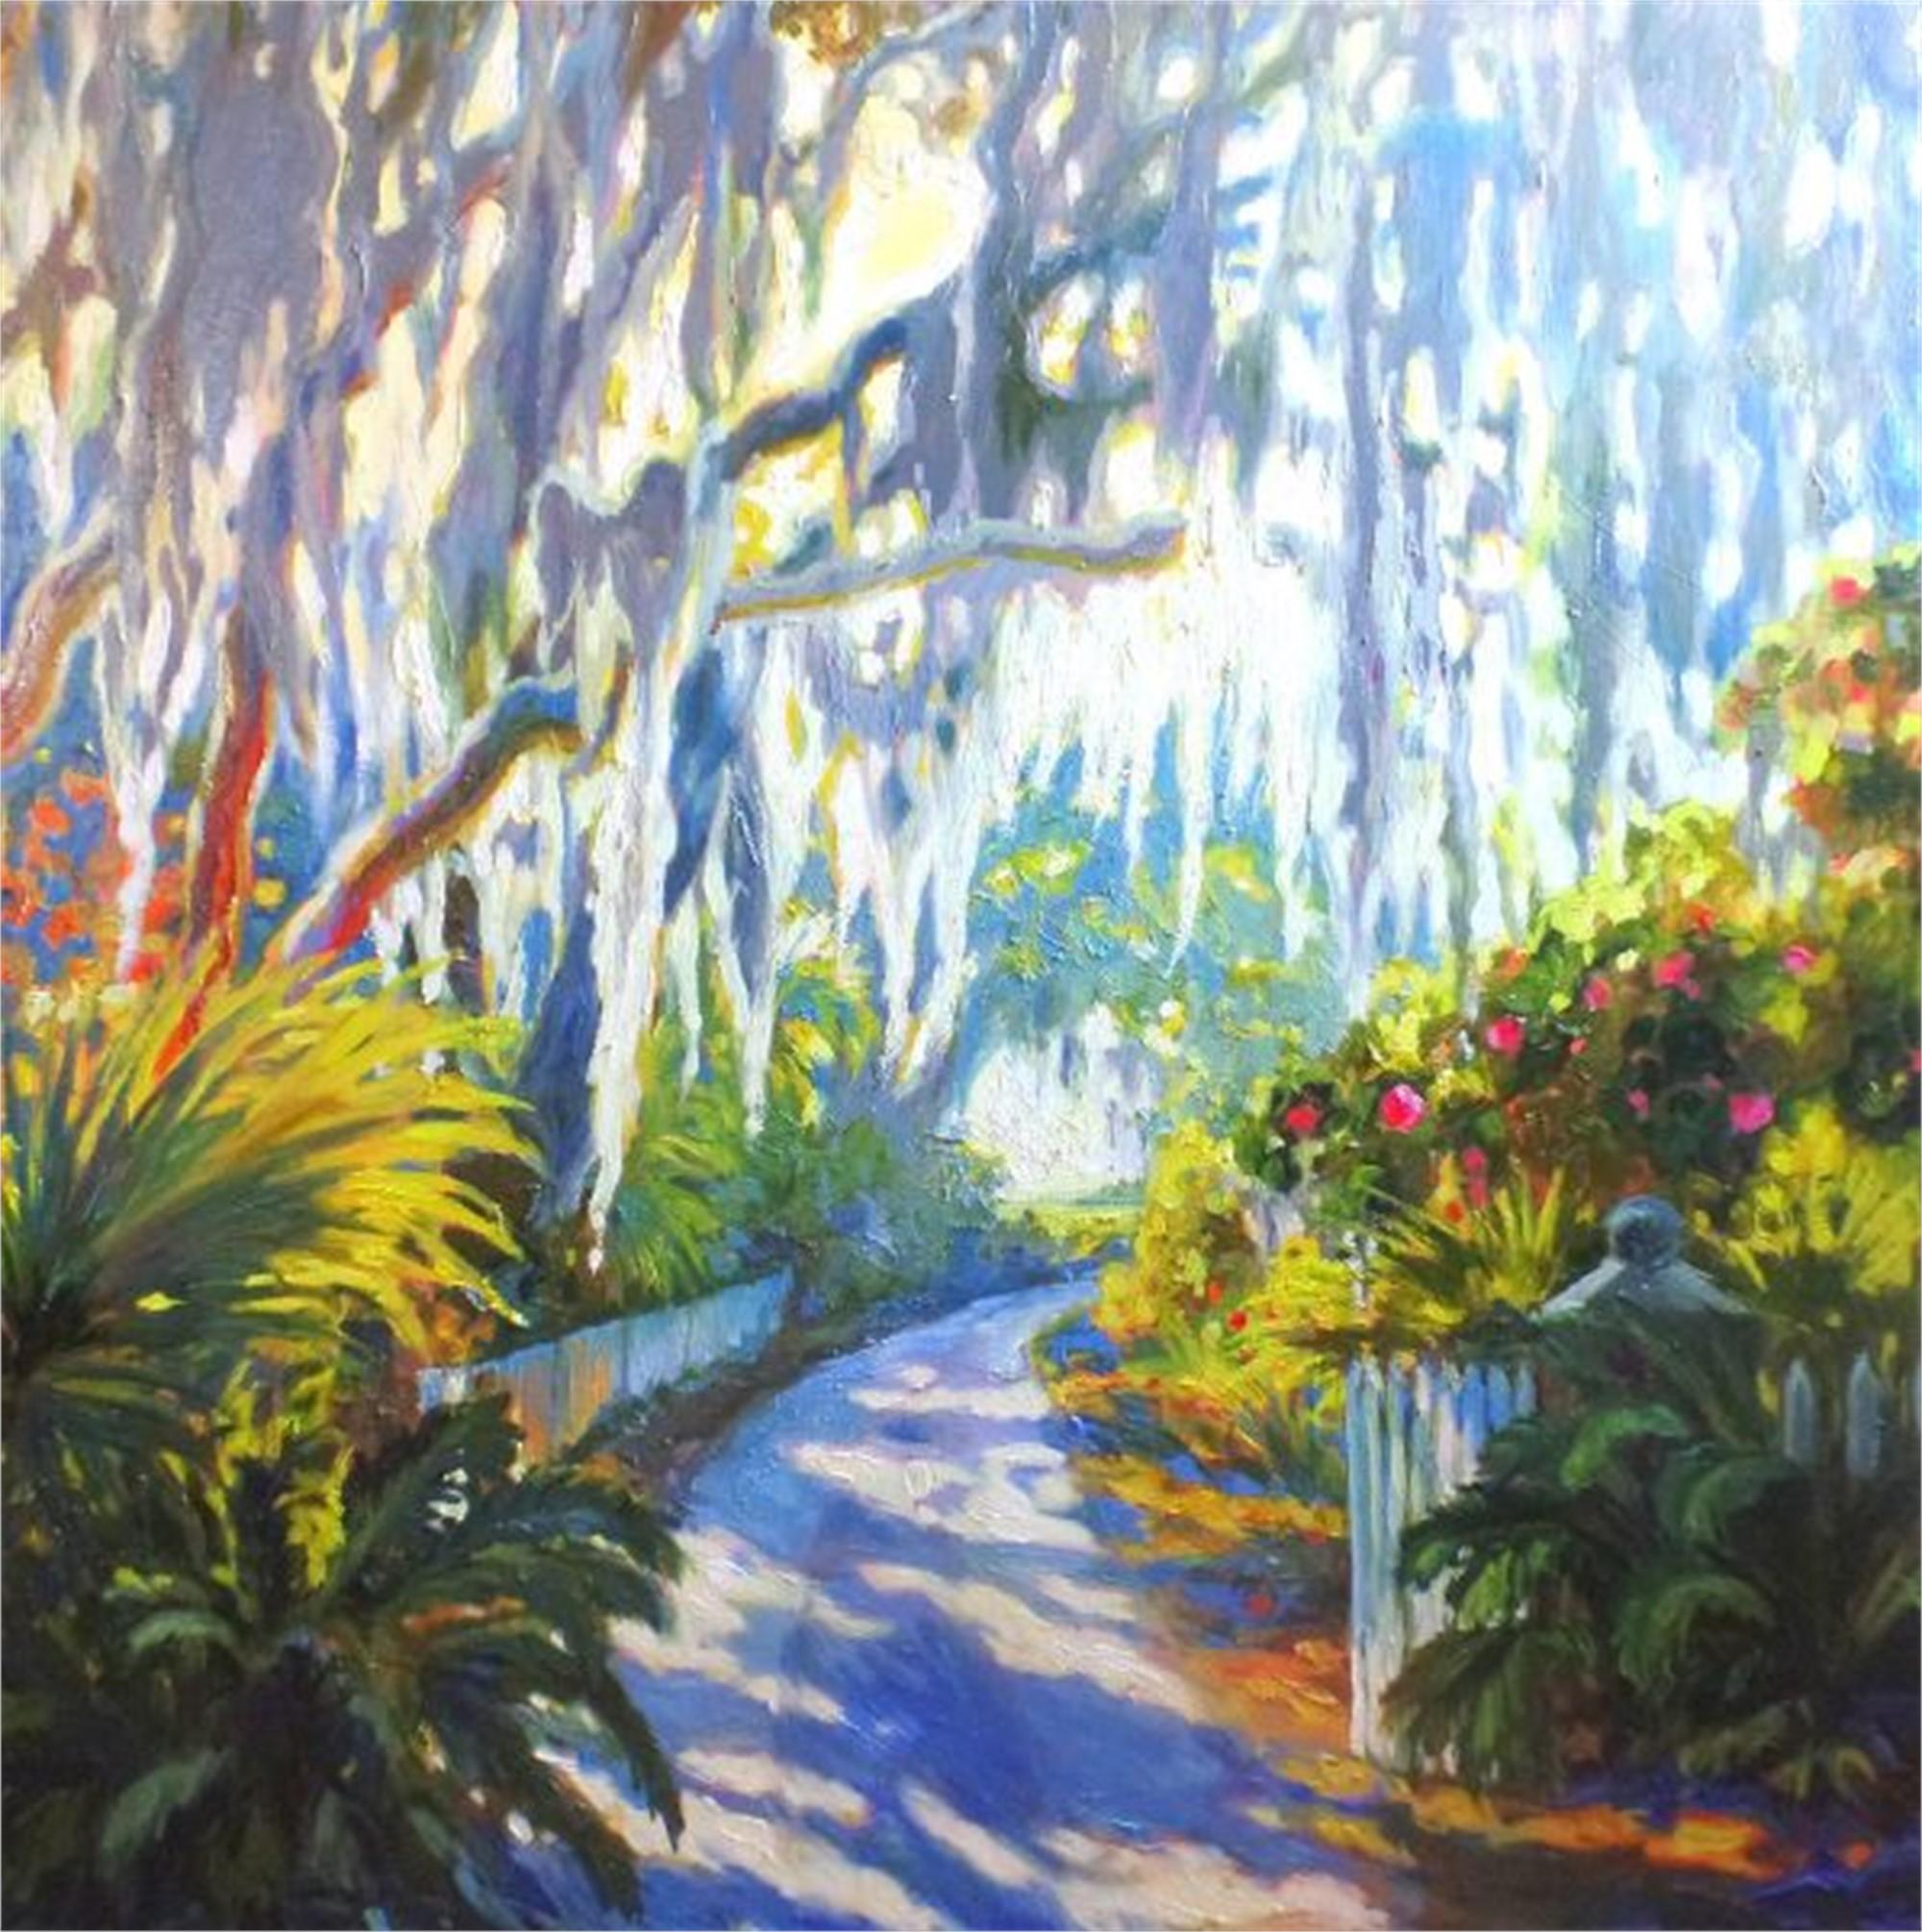 Rockville Paradise by Olessia Maximenko